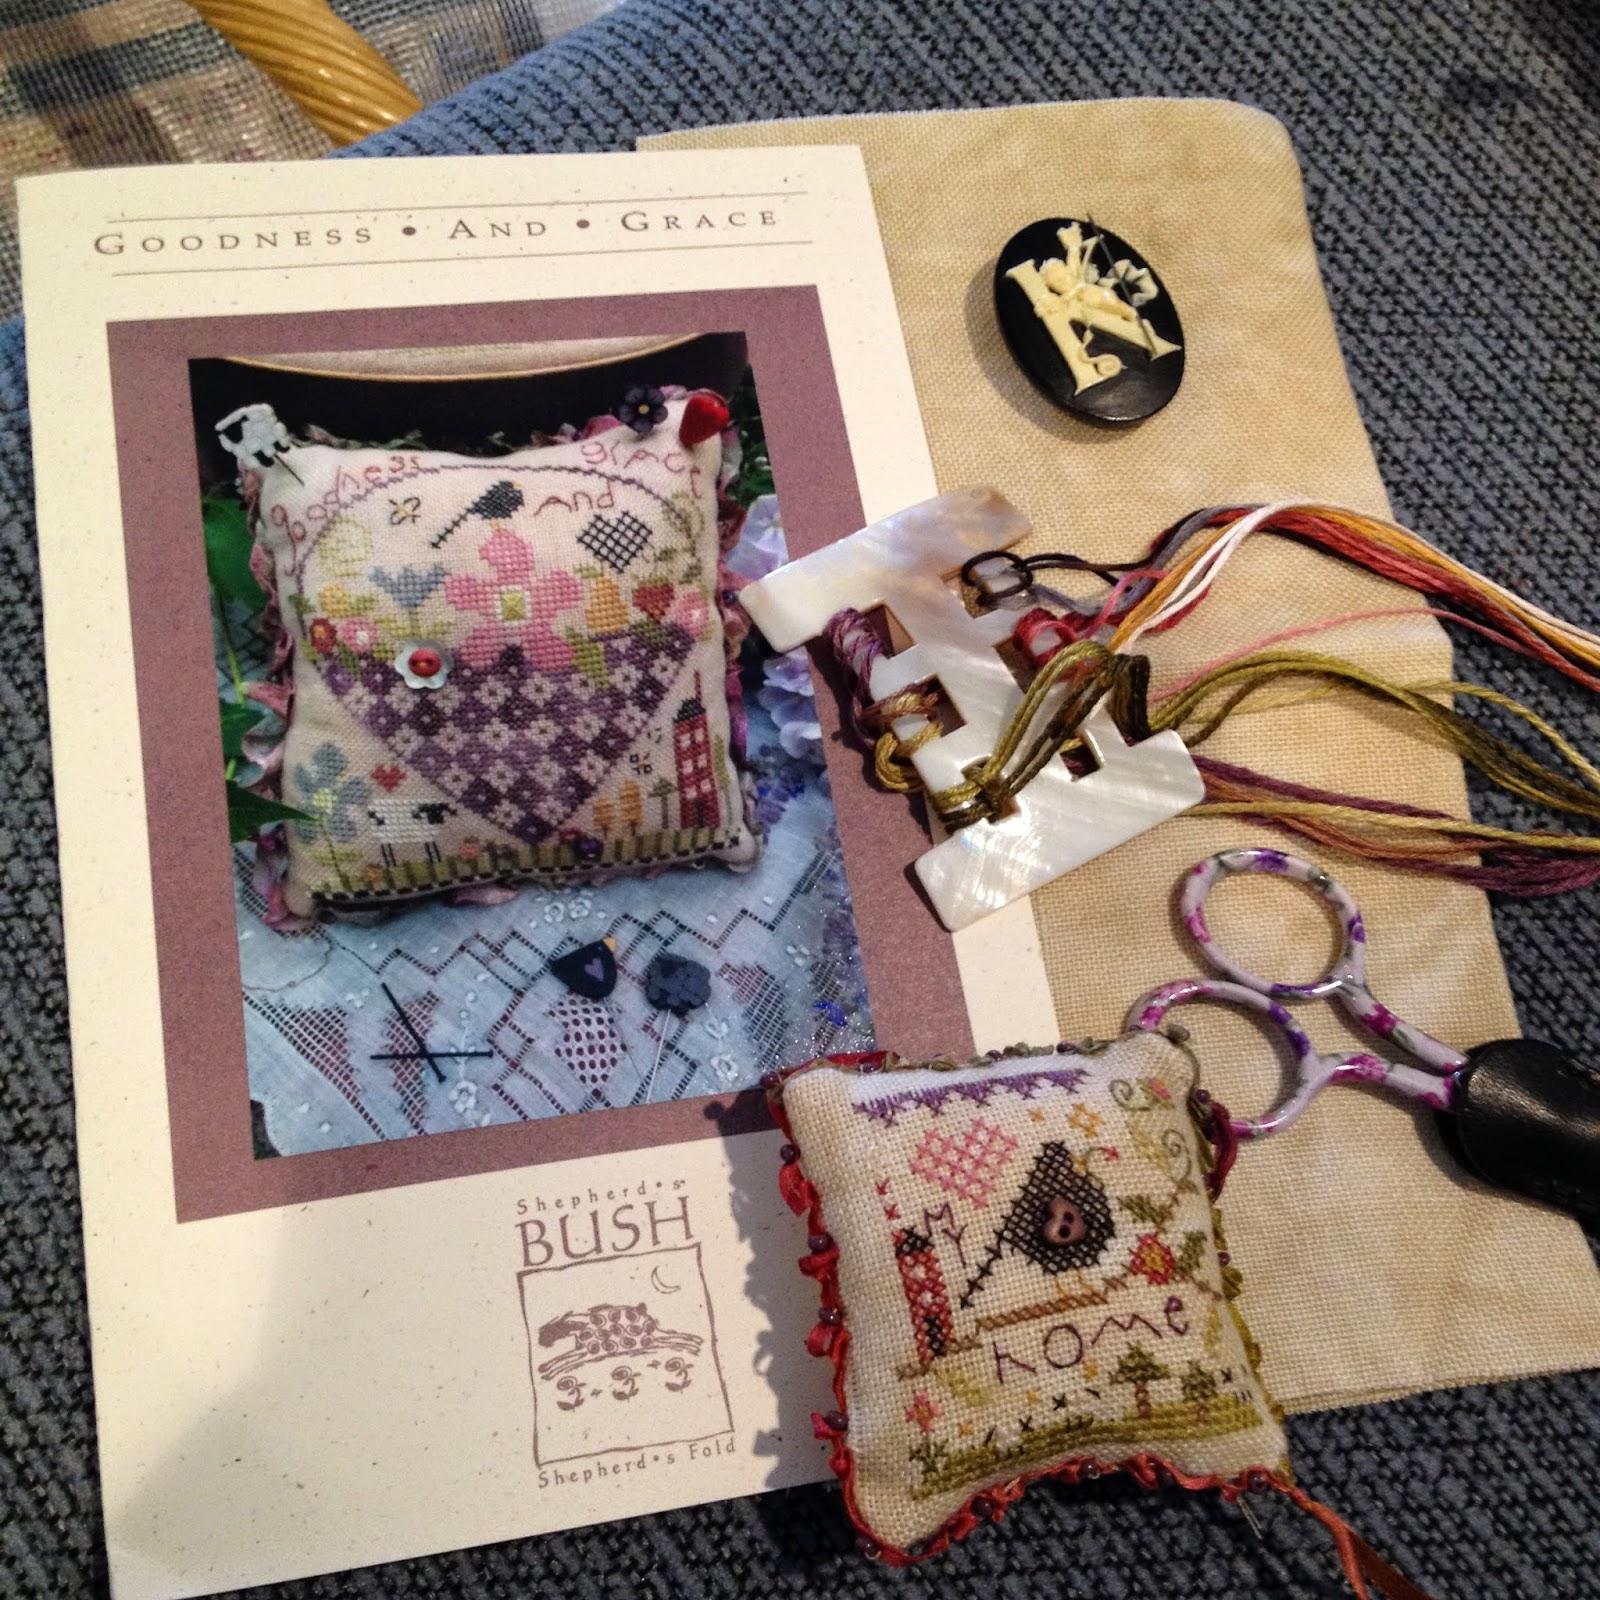 Buttercups Shepherd/'s Bush cross stitch pattern